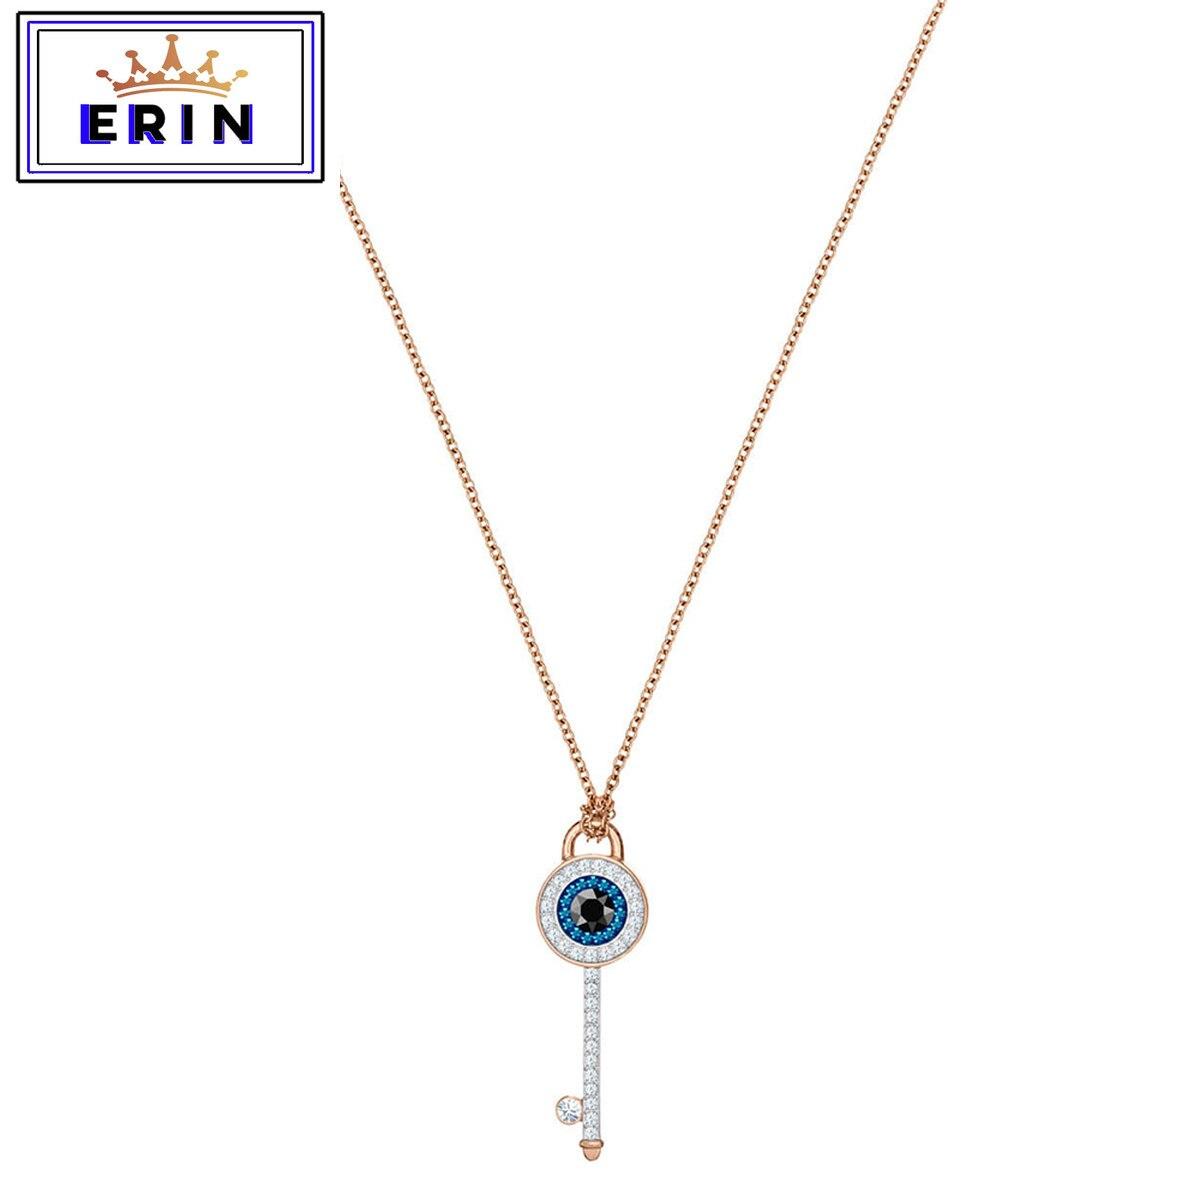 ERIN  High quality SWA, devil's eye anniversary Key Necklace